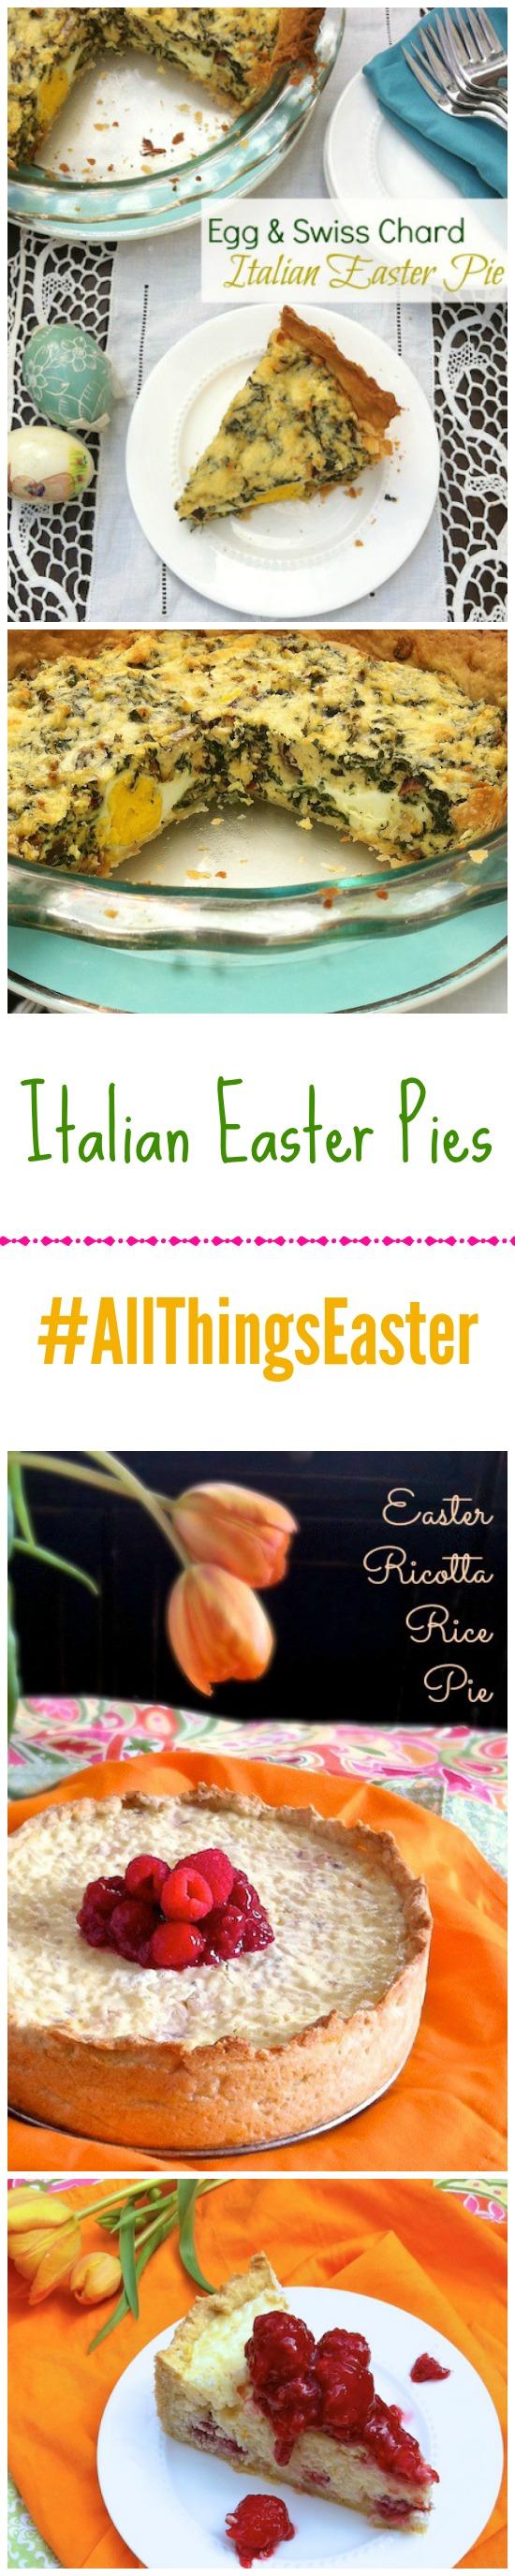 Italian Easter Pies: Egg & Swiss Chard Pie and Ricotta Rice Pie with Raspberry Glaze @tspbasil